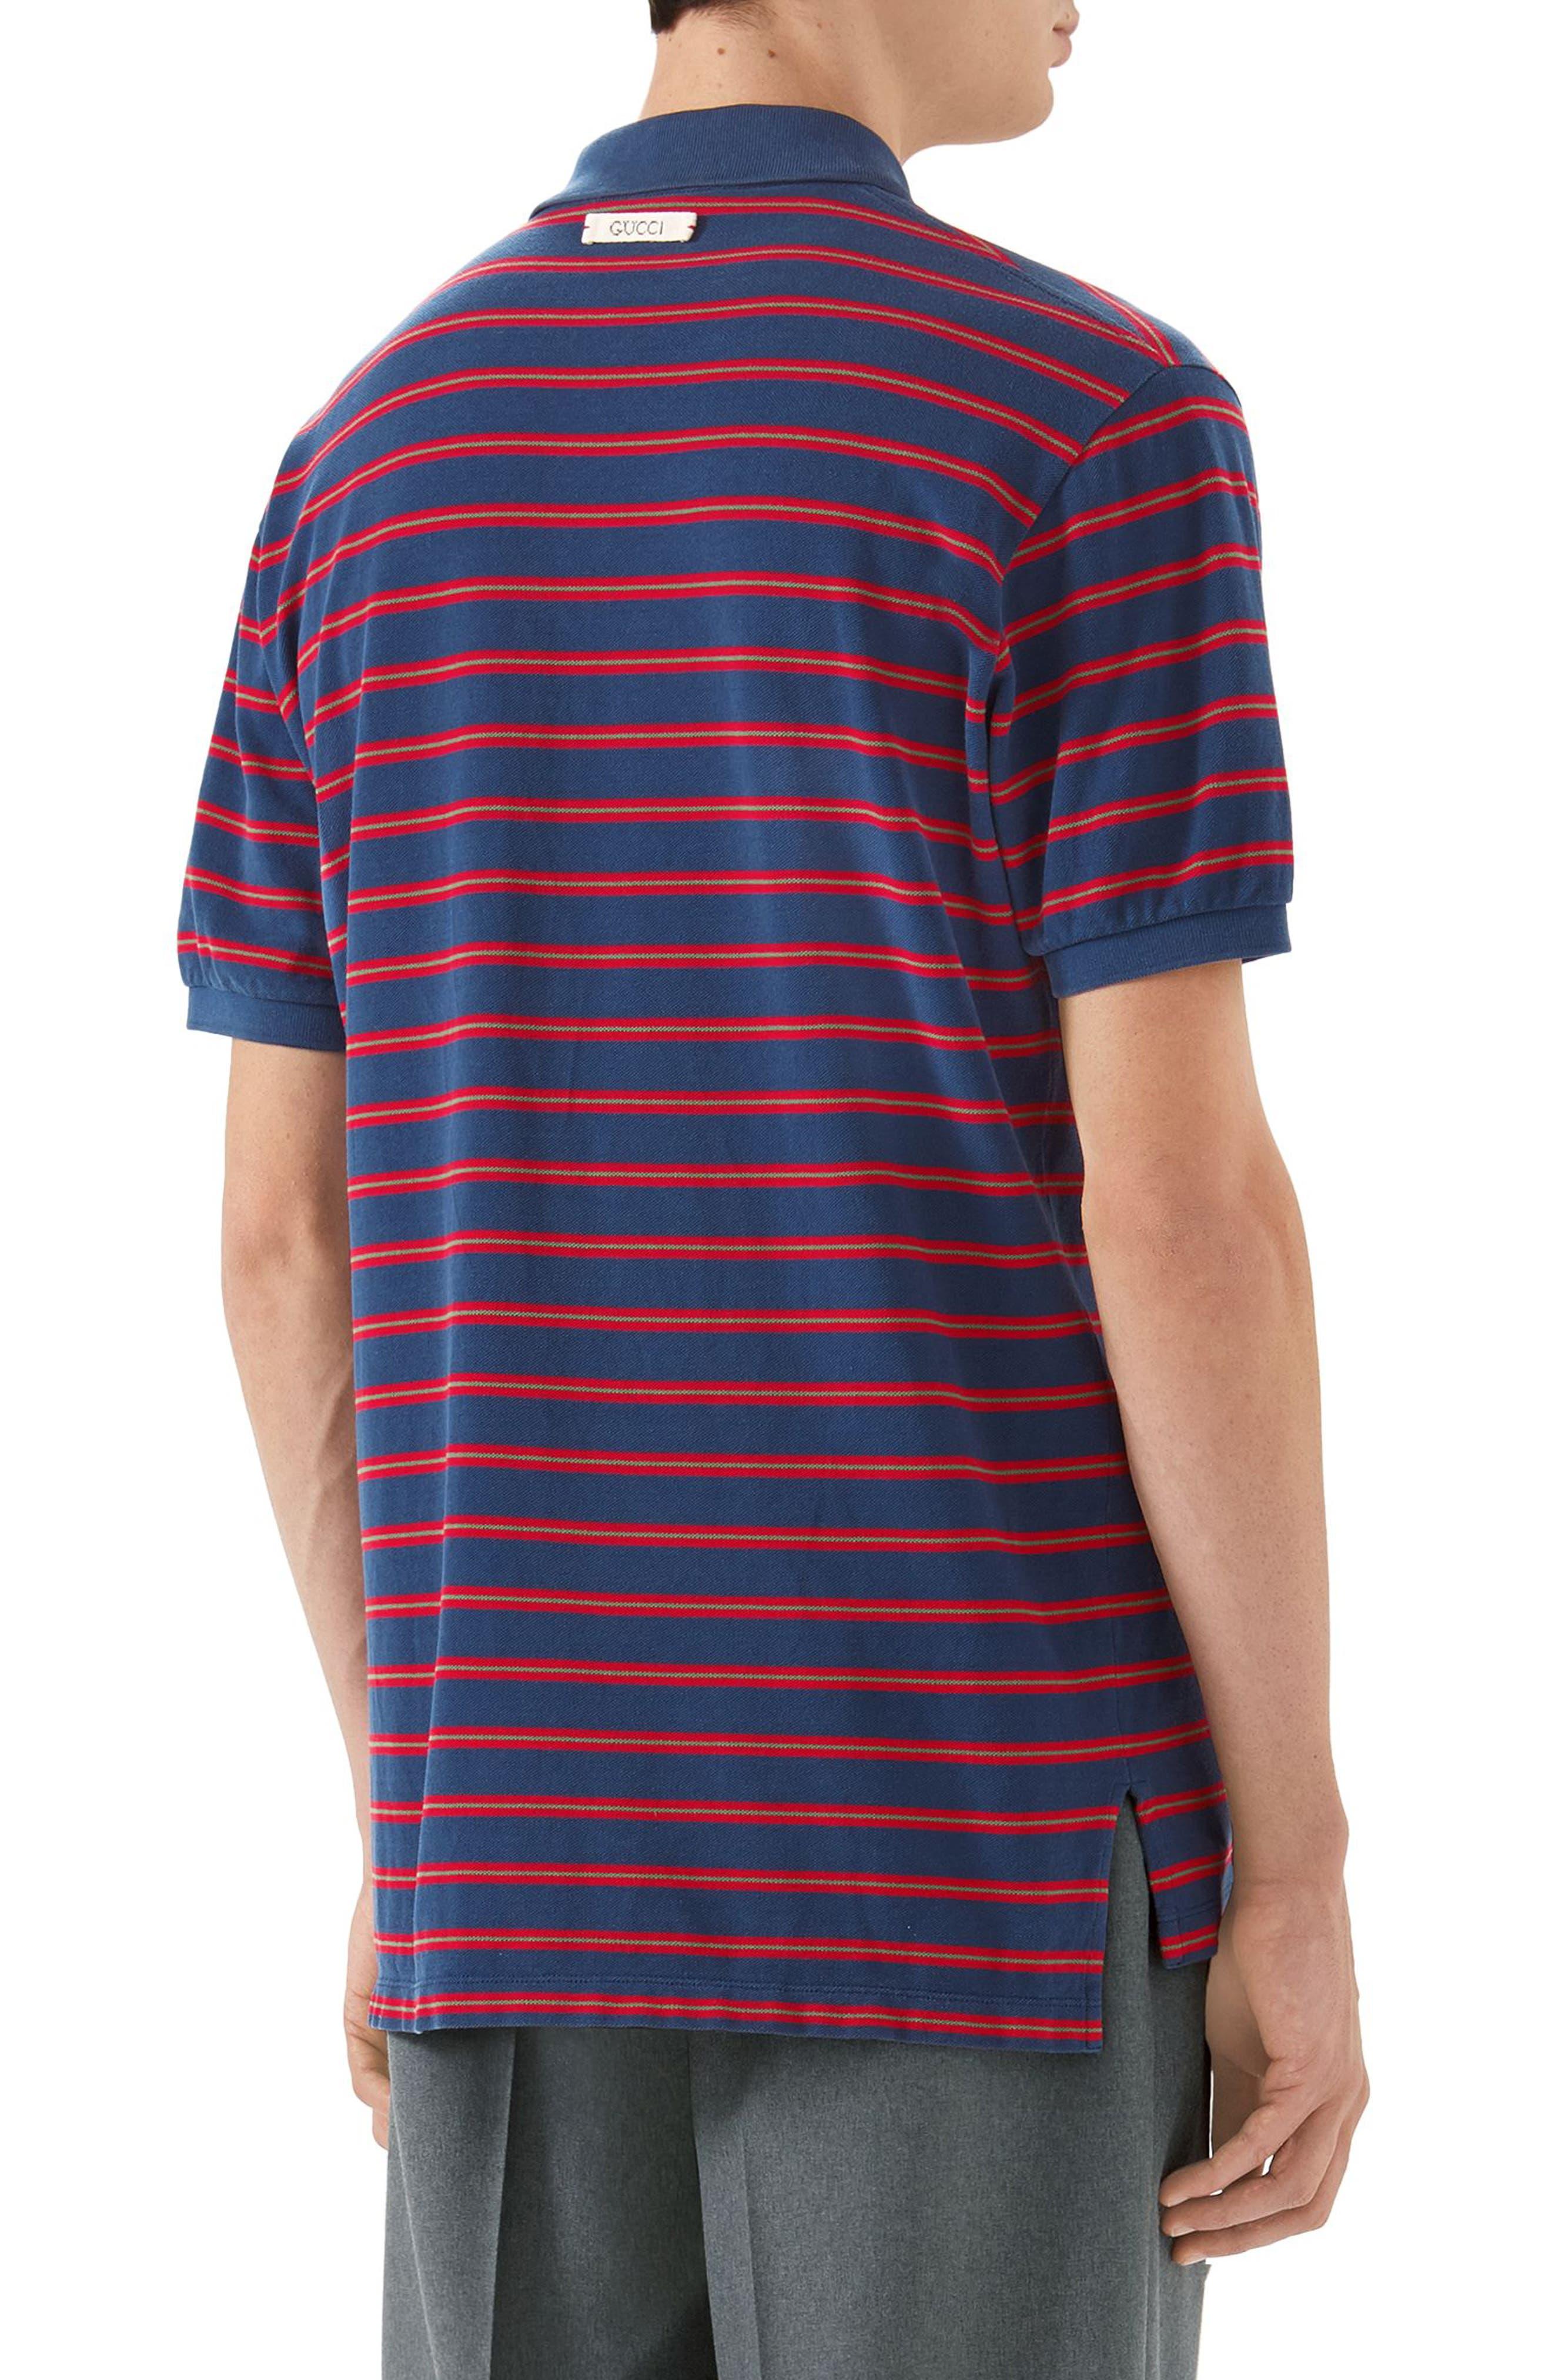 b441c8d72824 Gucci Stonewashed Stripe Cotton Polo Shirt In 4454